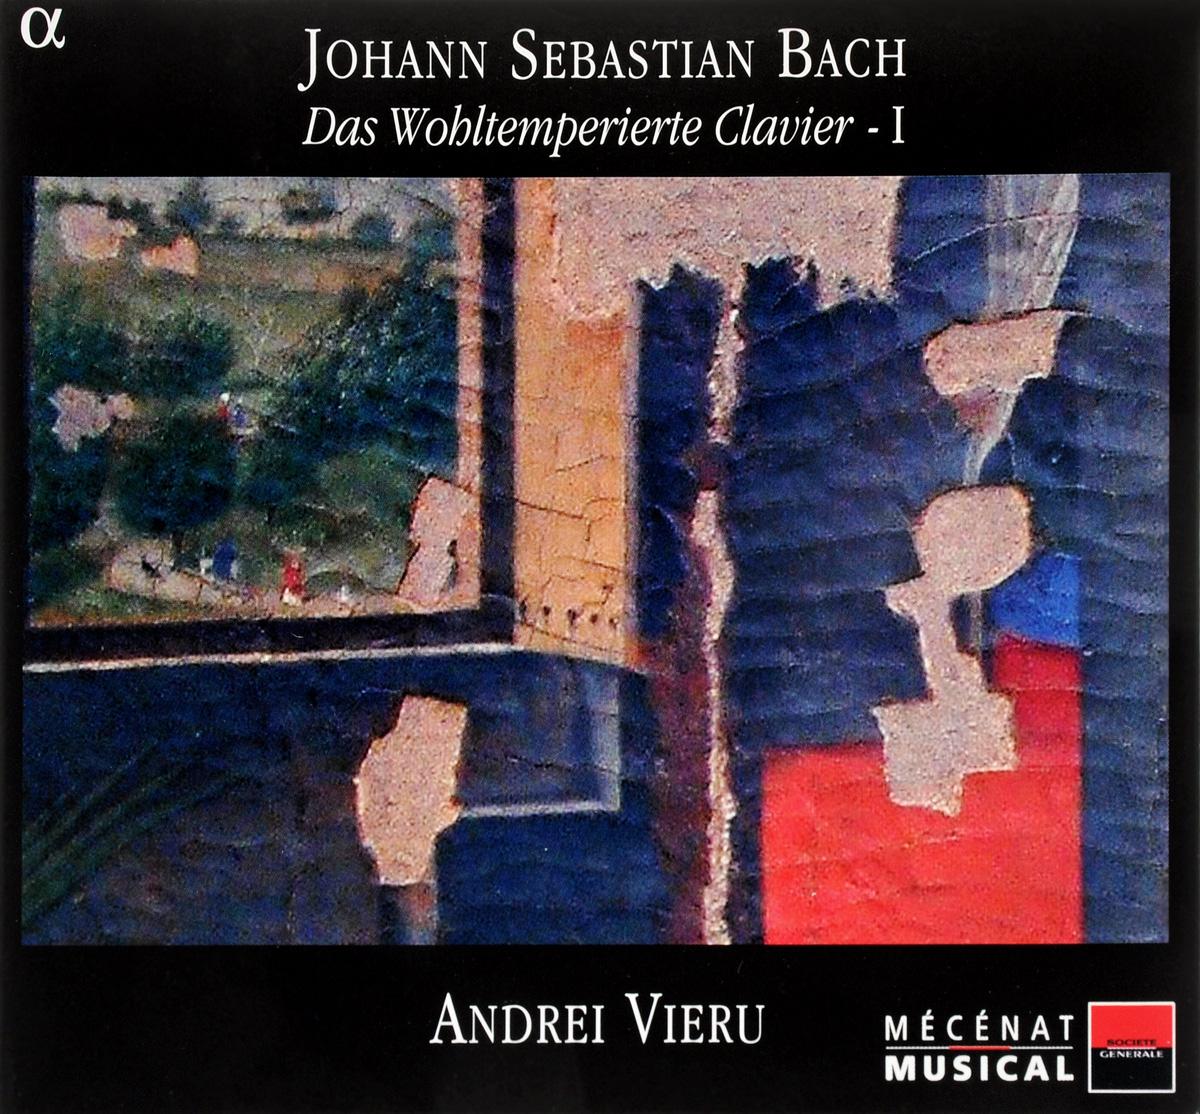 цена на Johann Sebastian Bach - Andrei Vieru. Das Wohltemperierte Clavier - I (2 CD)